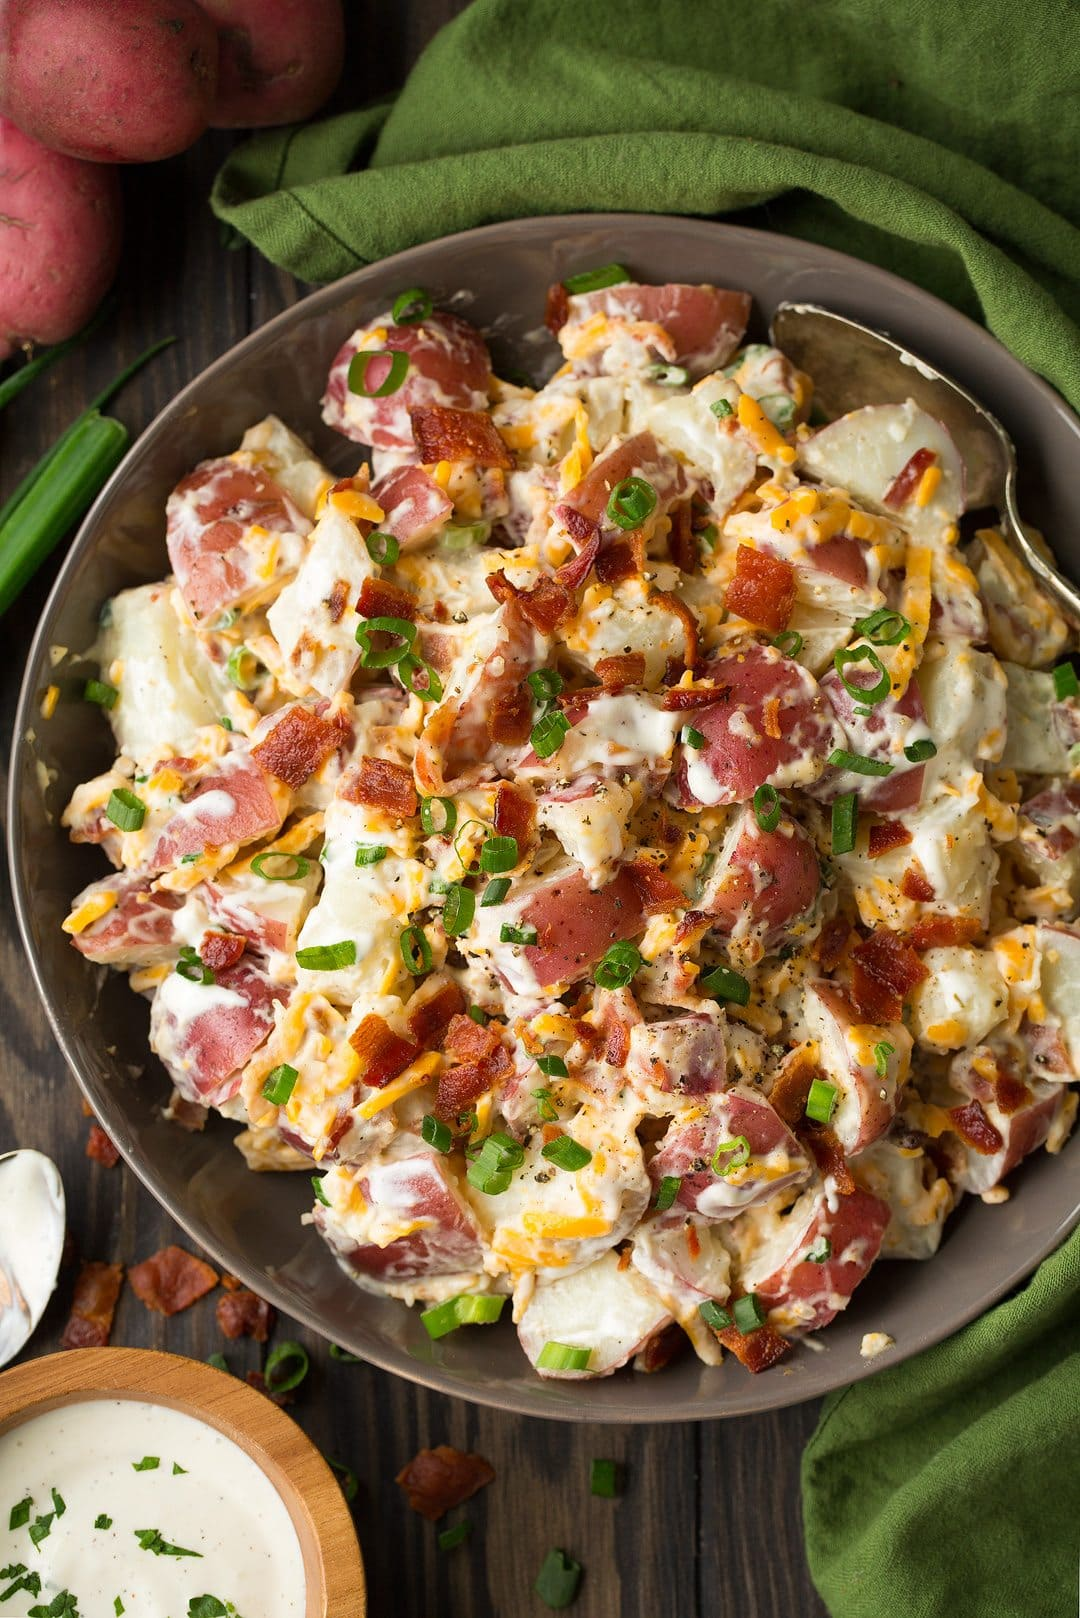 Simple Potato Salad Recipe With Bacon